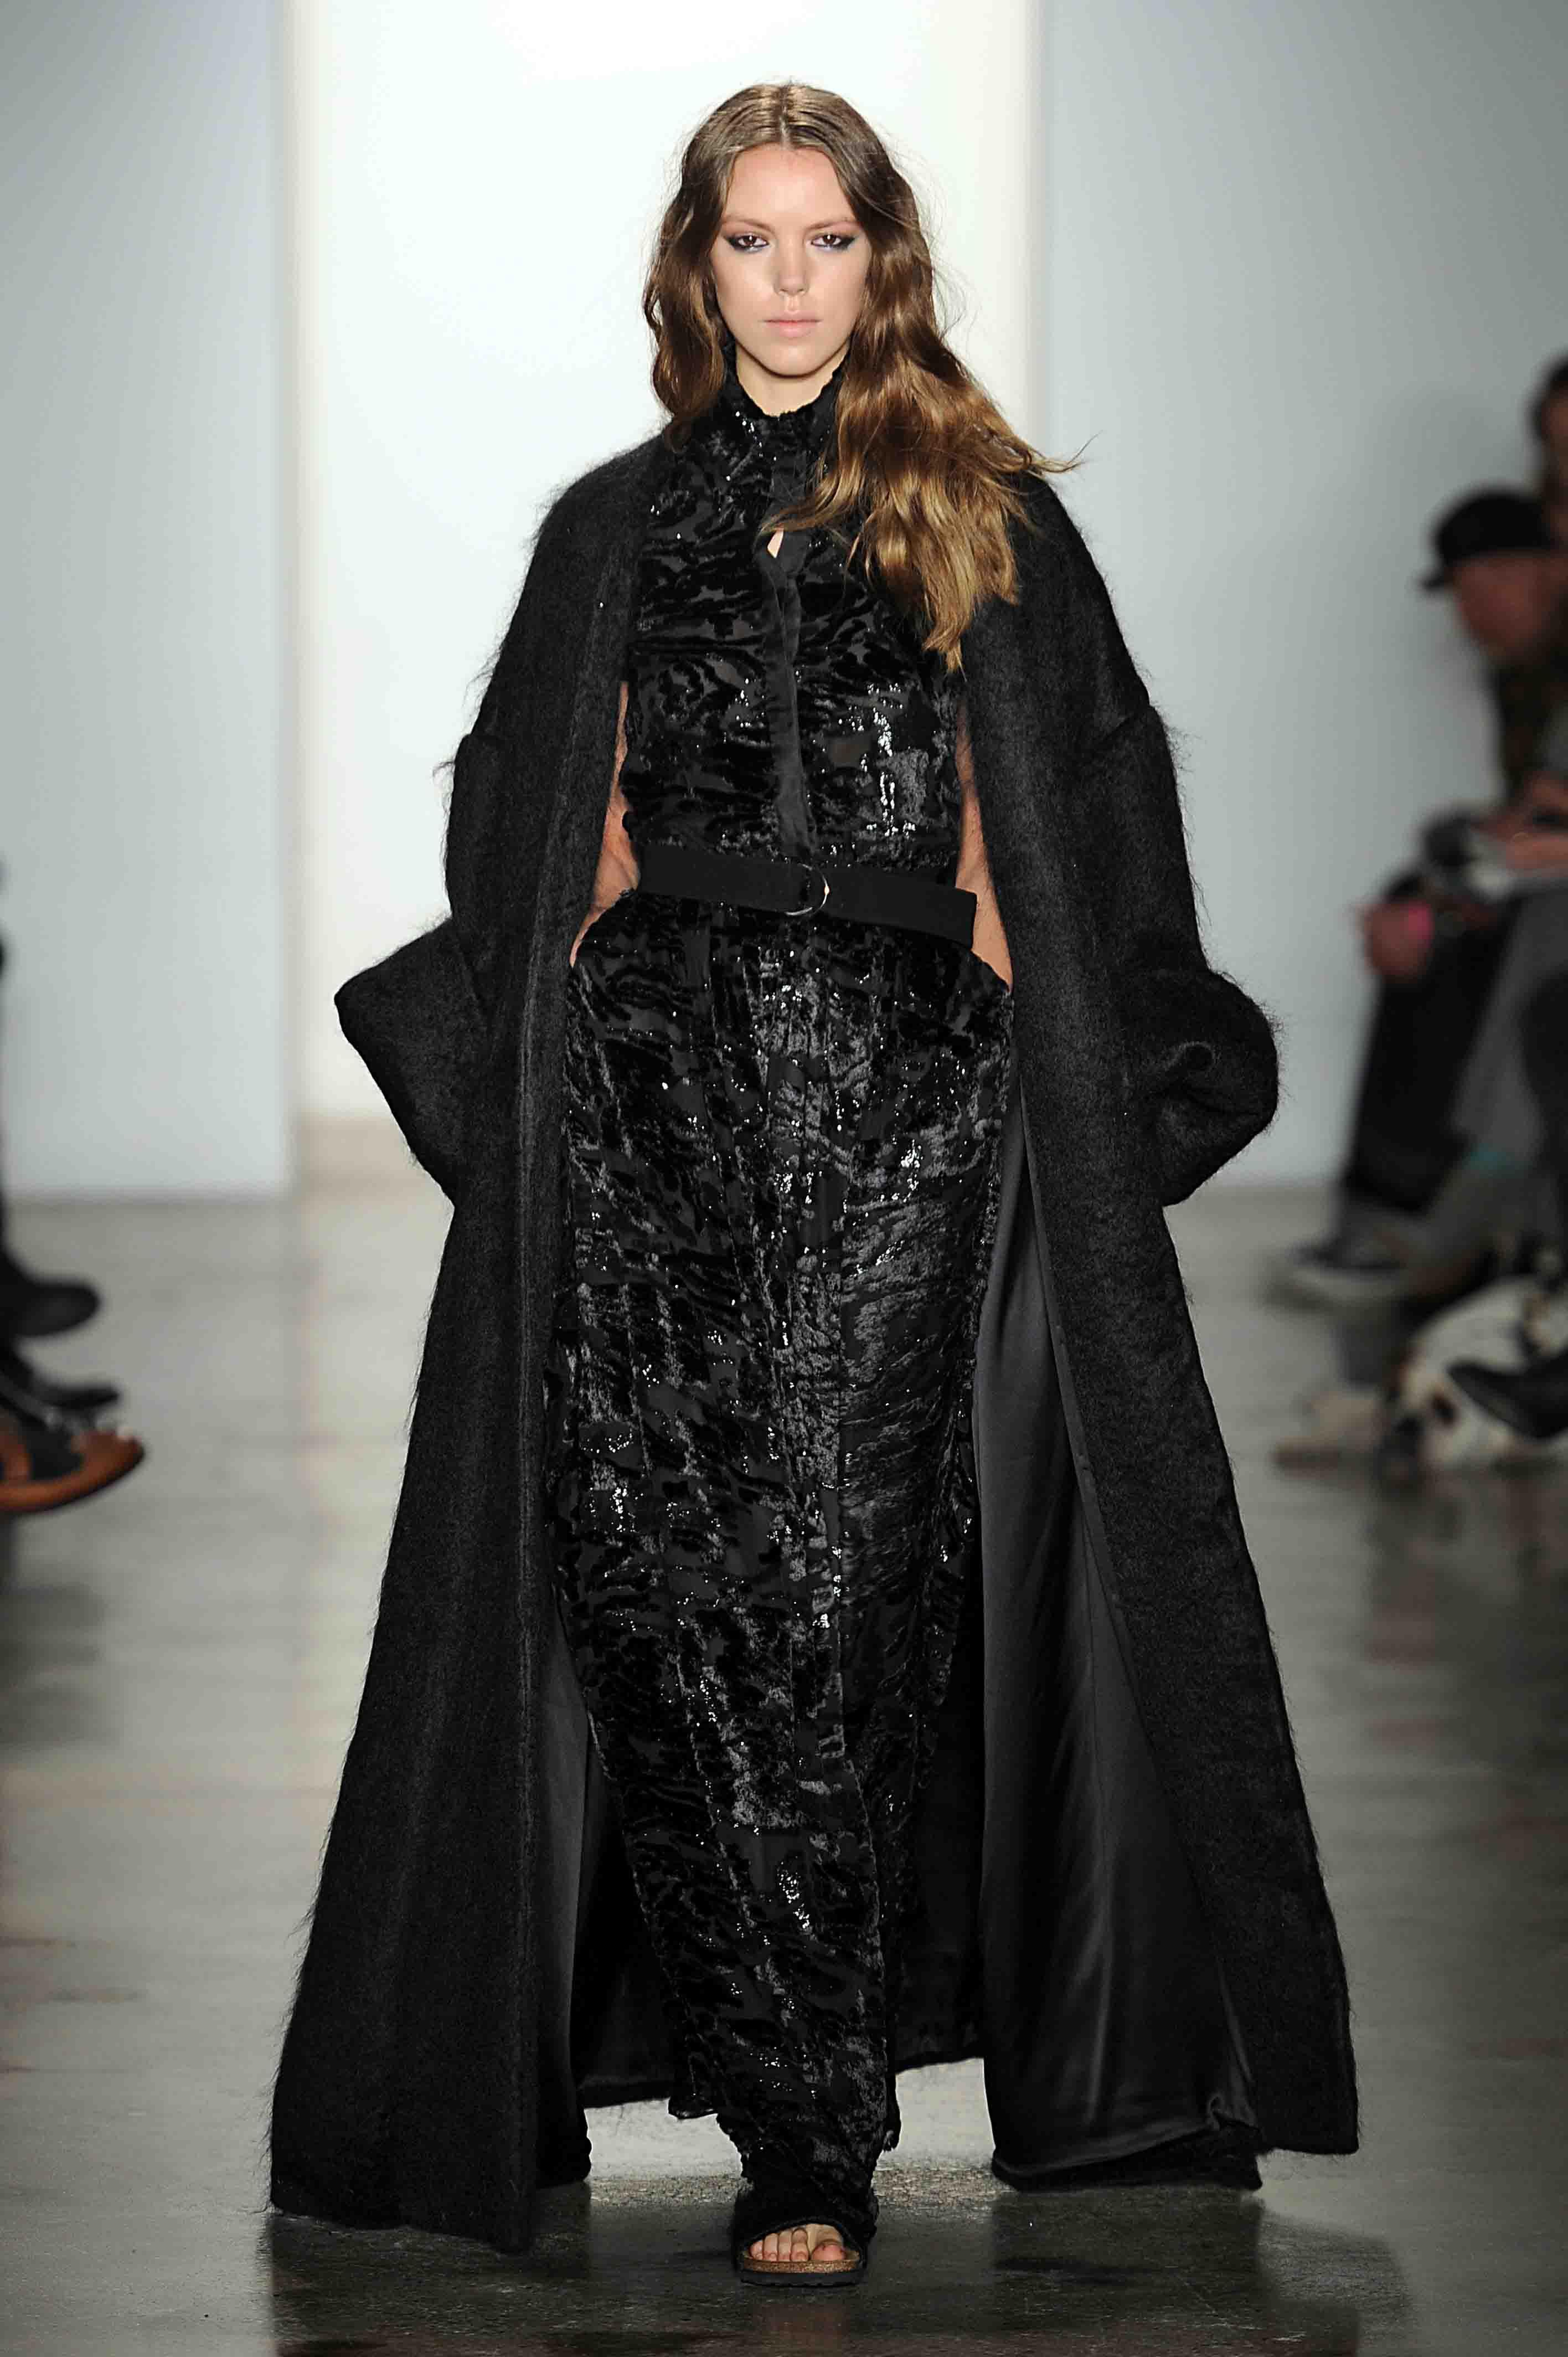 HoughtonWomenswear Fall Winter 2014 New York Fashion Week February 2014